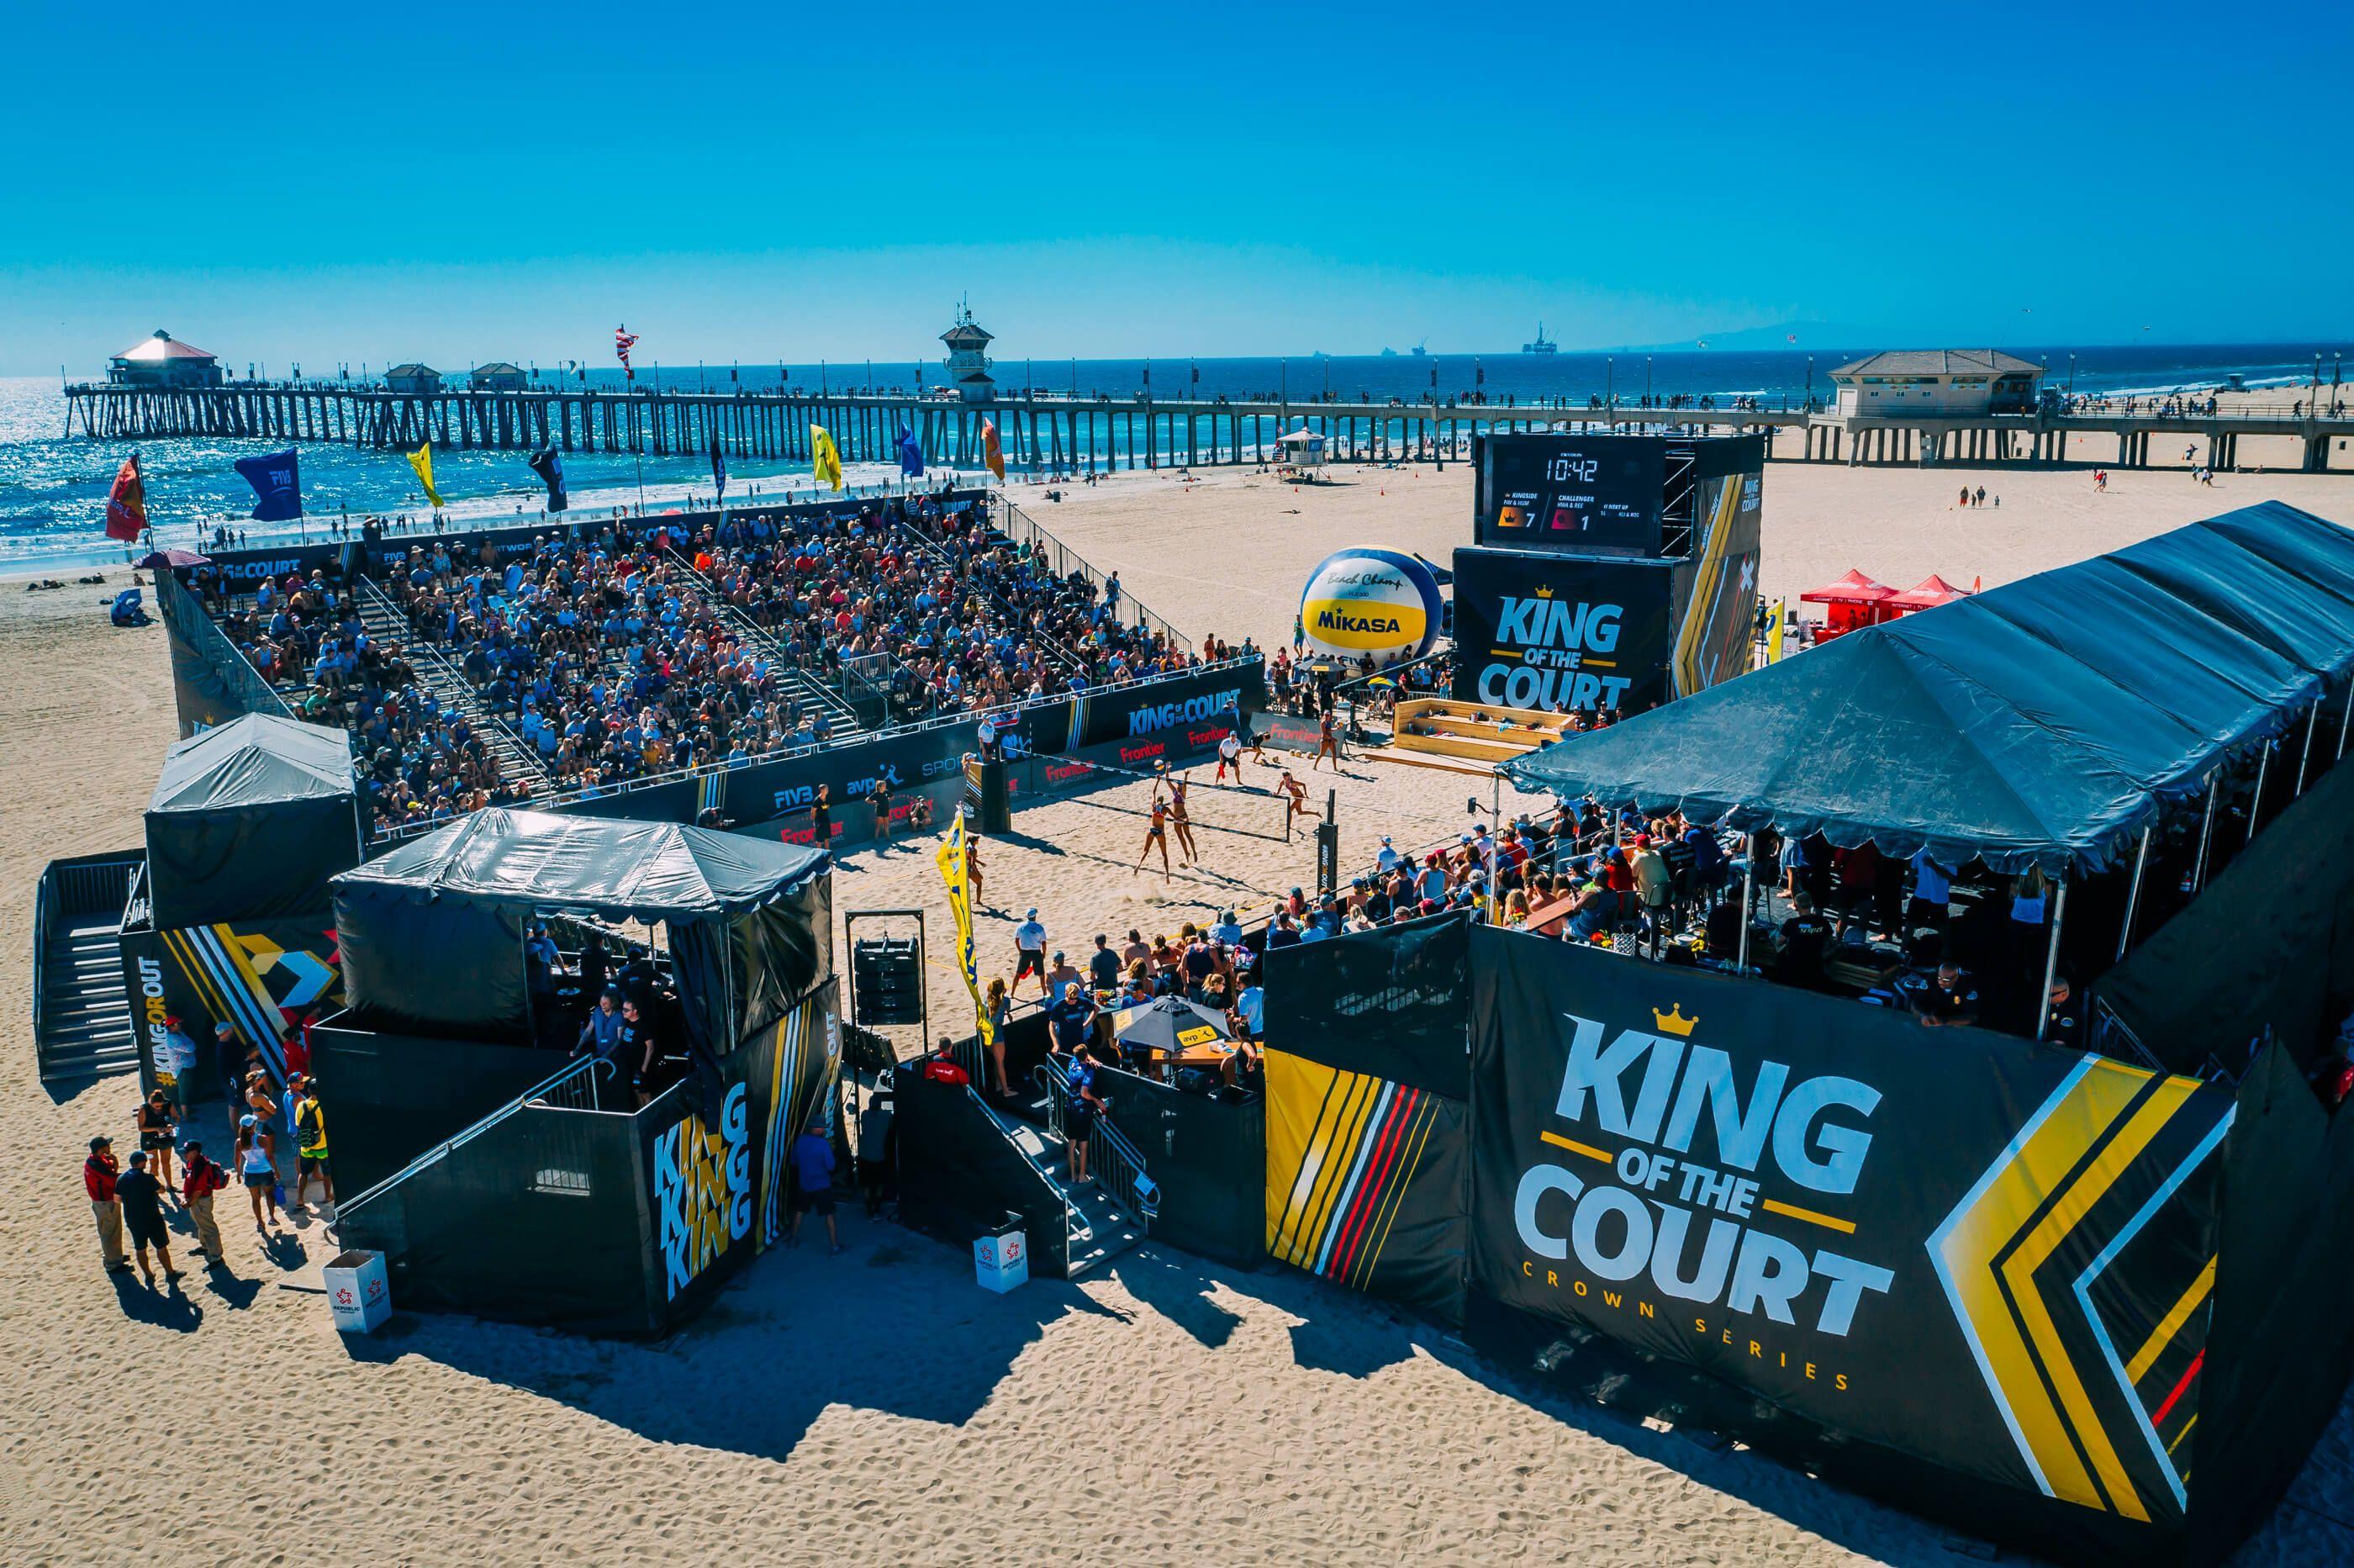 King Of The Court Huntington Beach Photo Gallery With Images Beach Photos Huntington Beach Photo